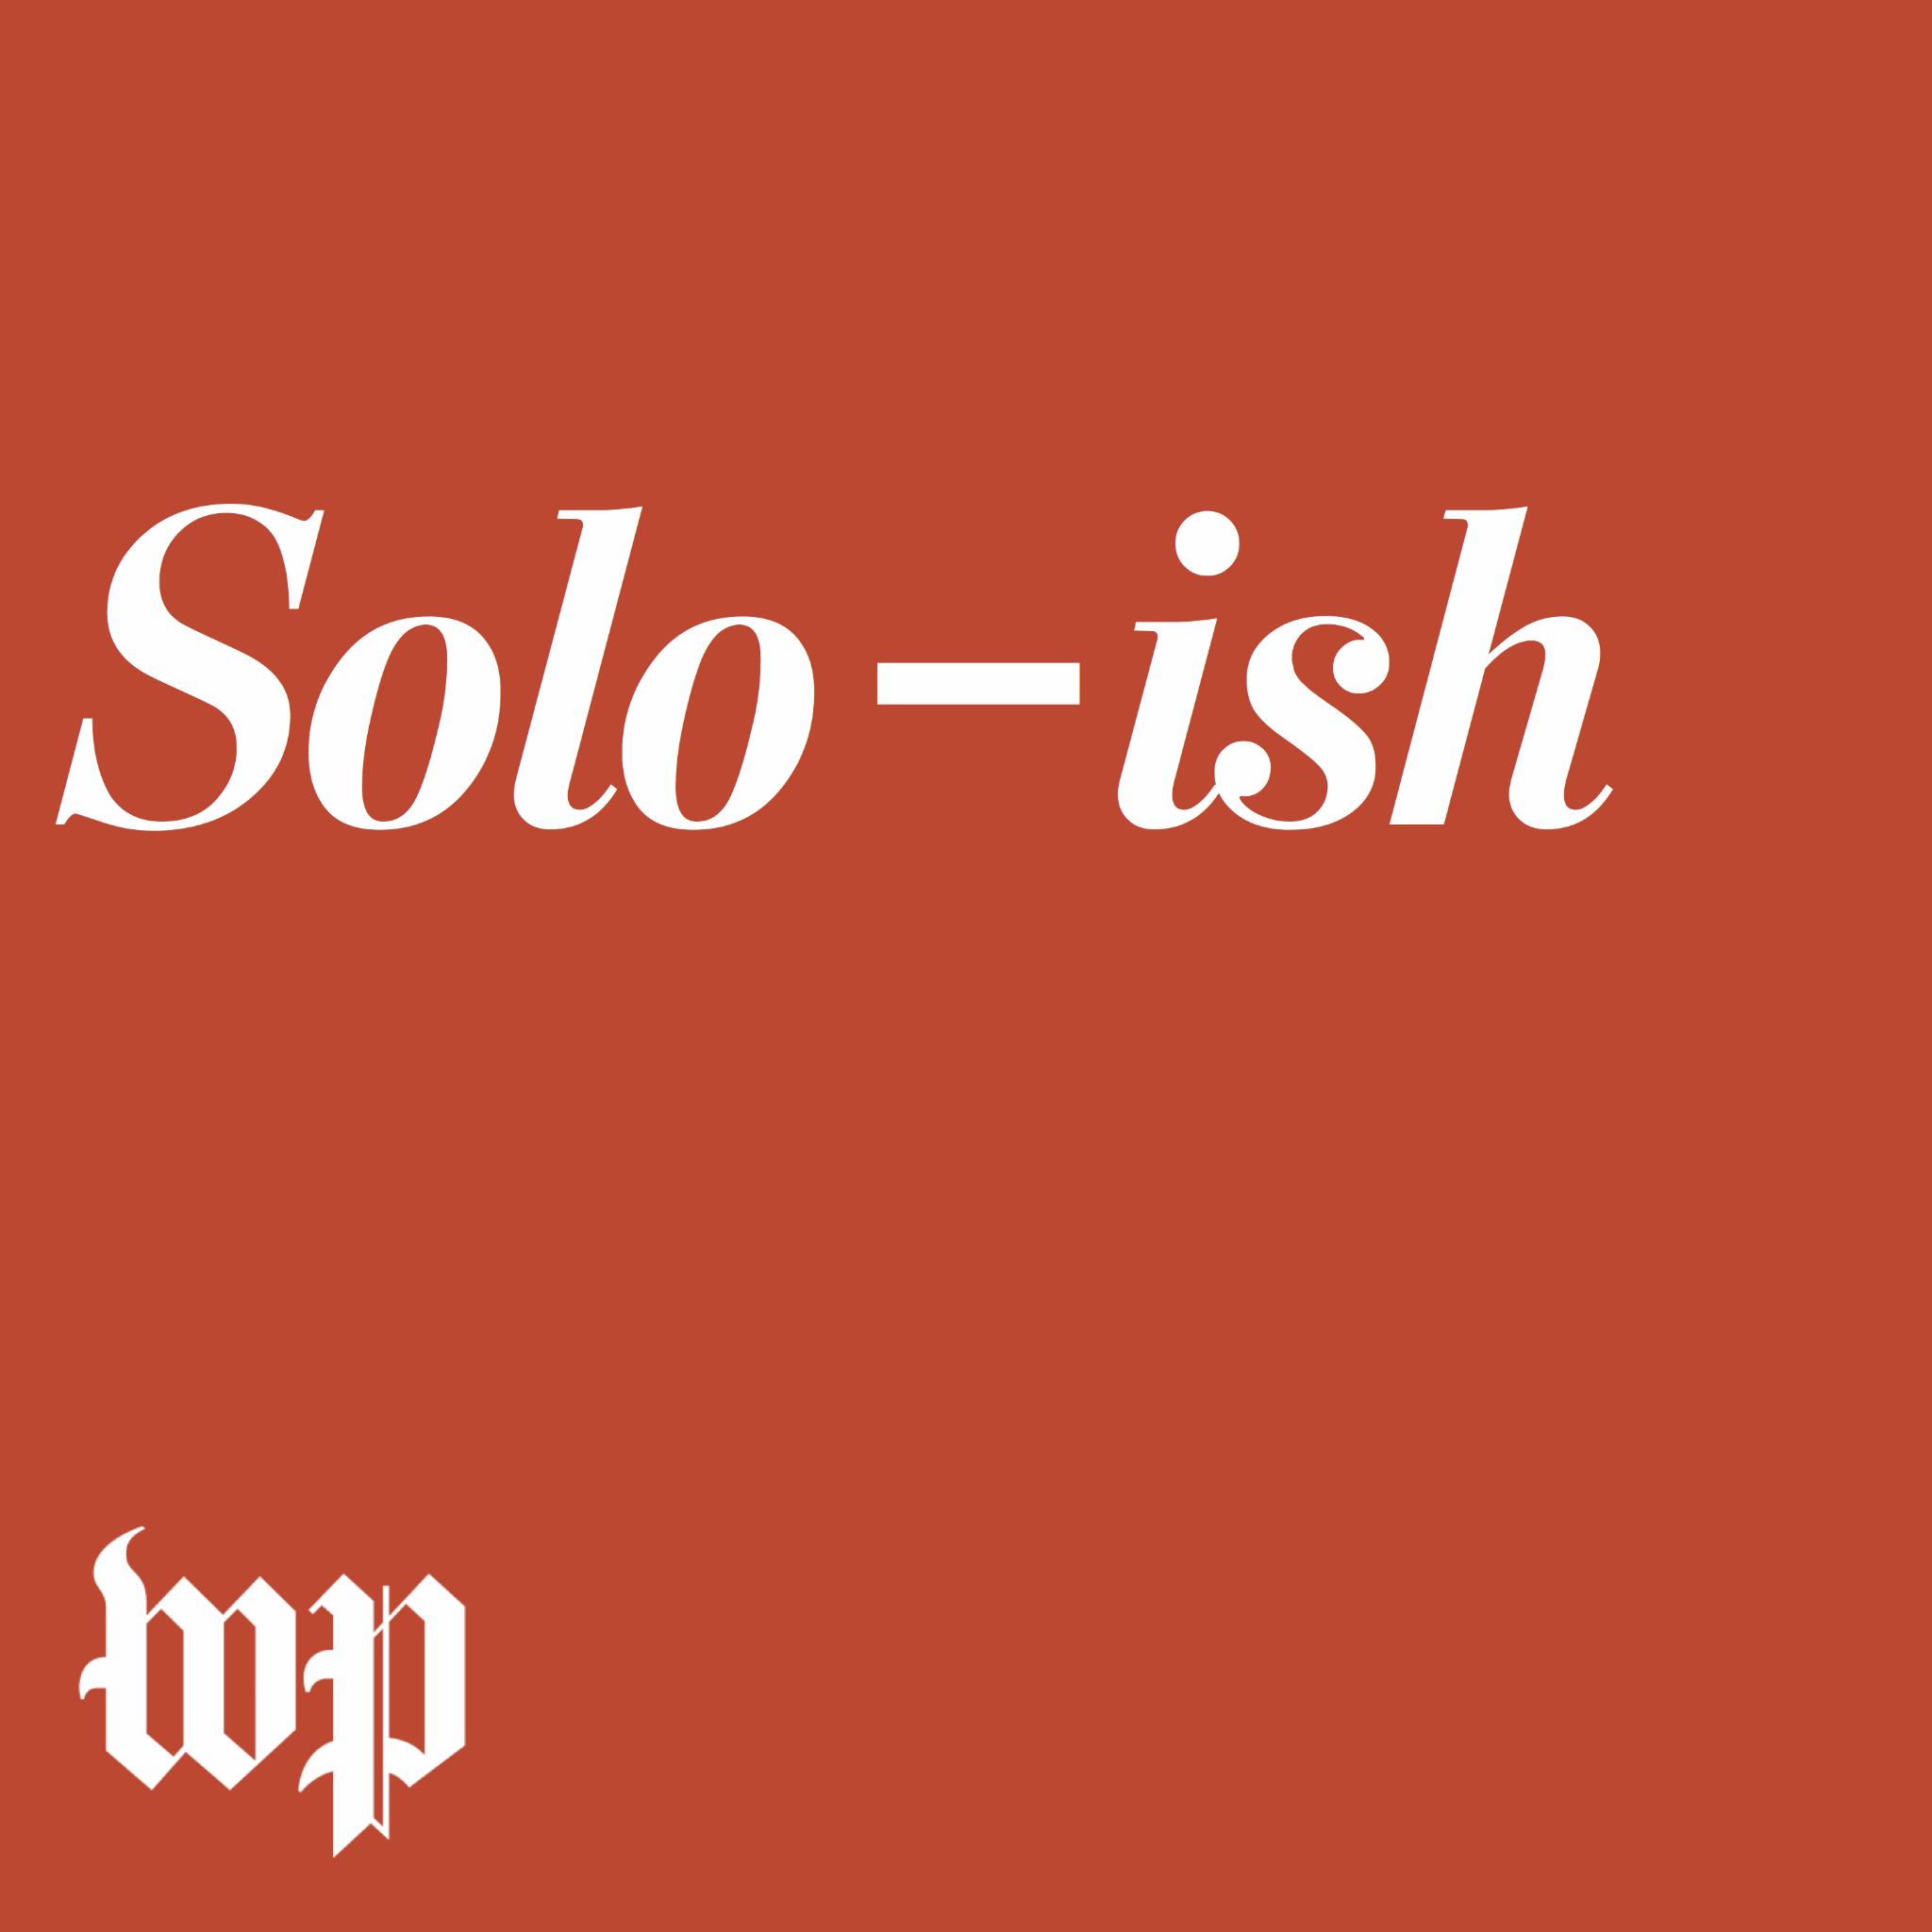 soloish.jpg